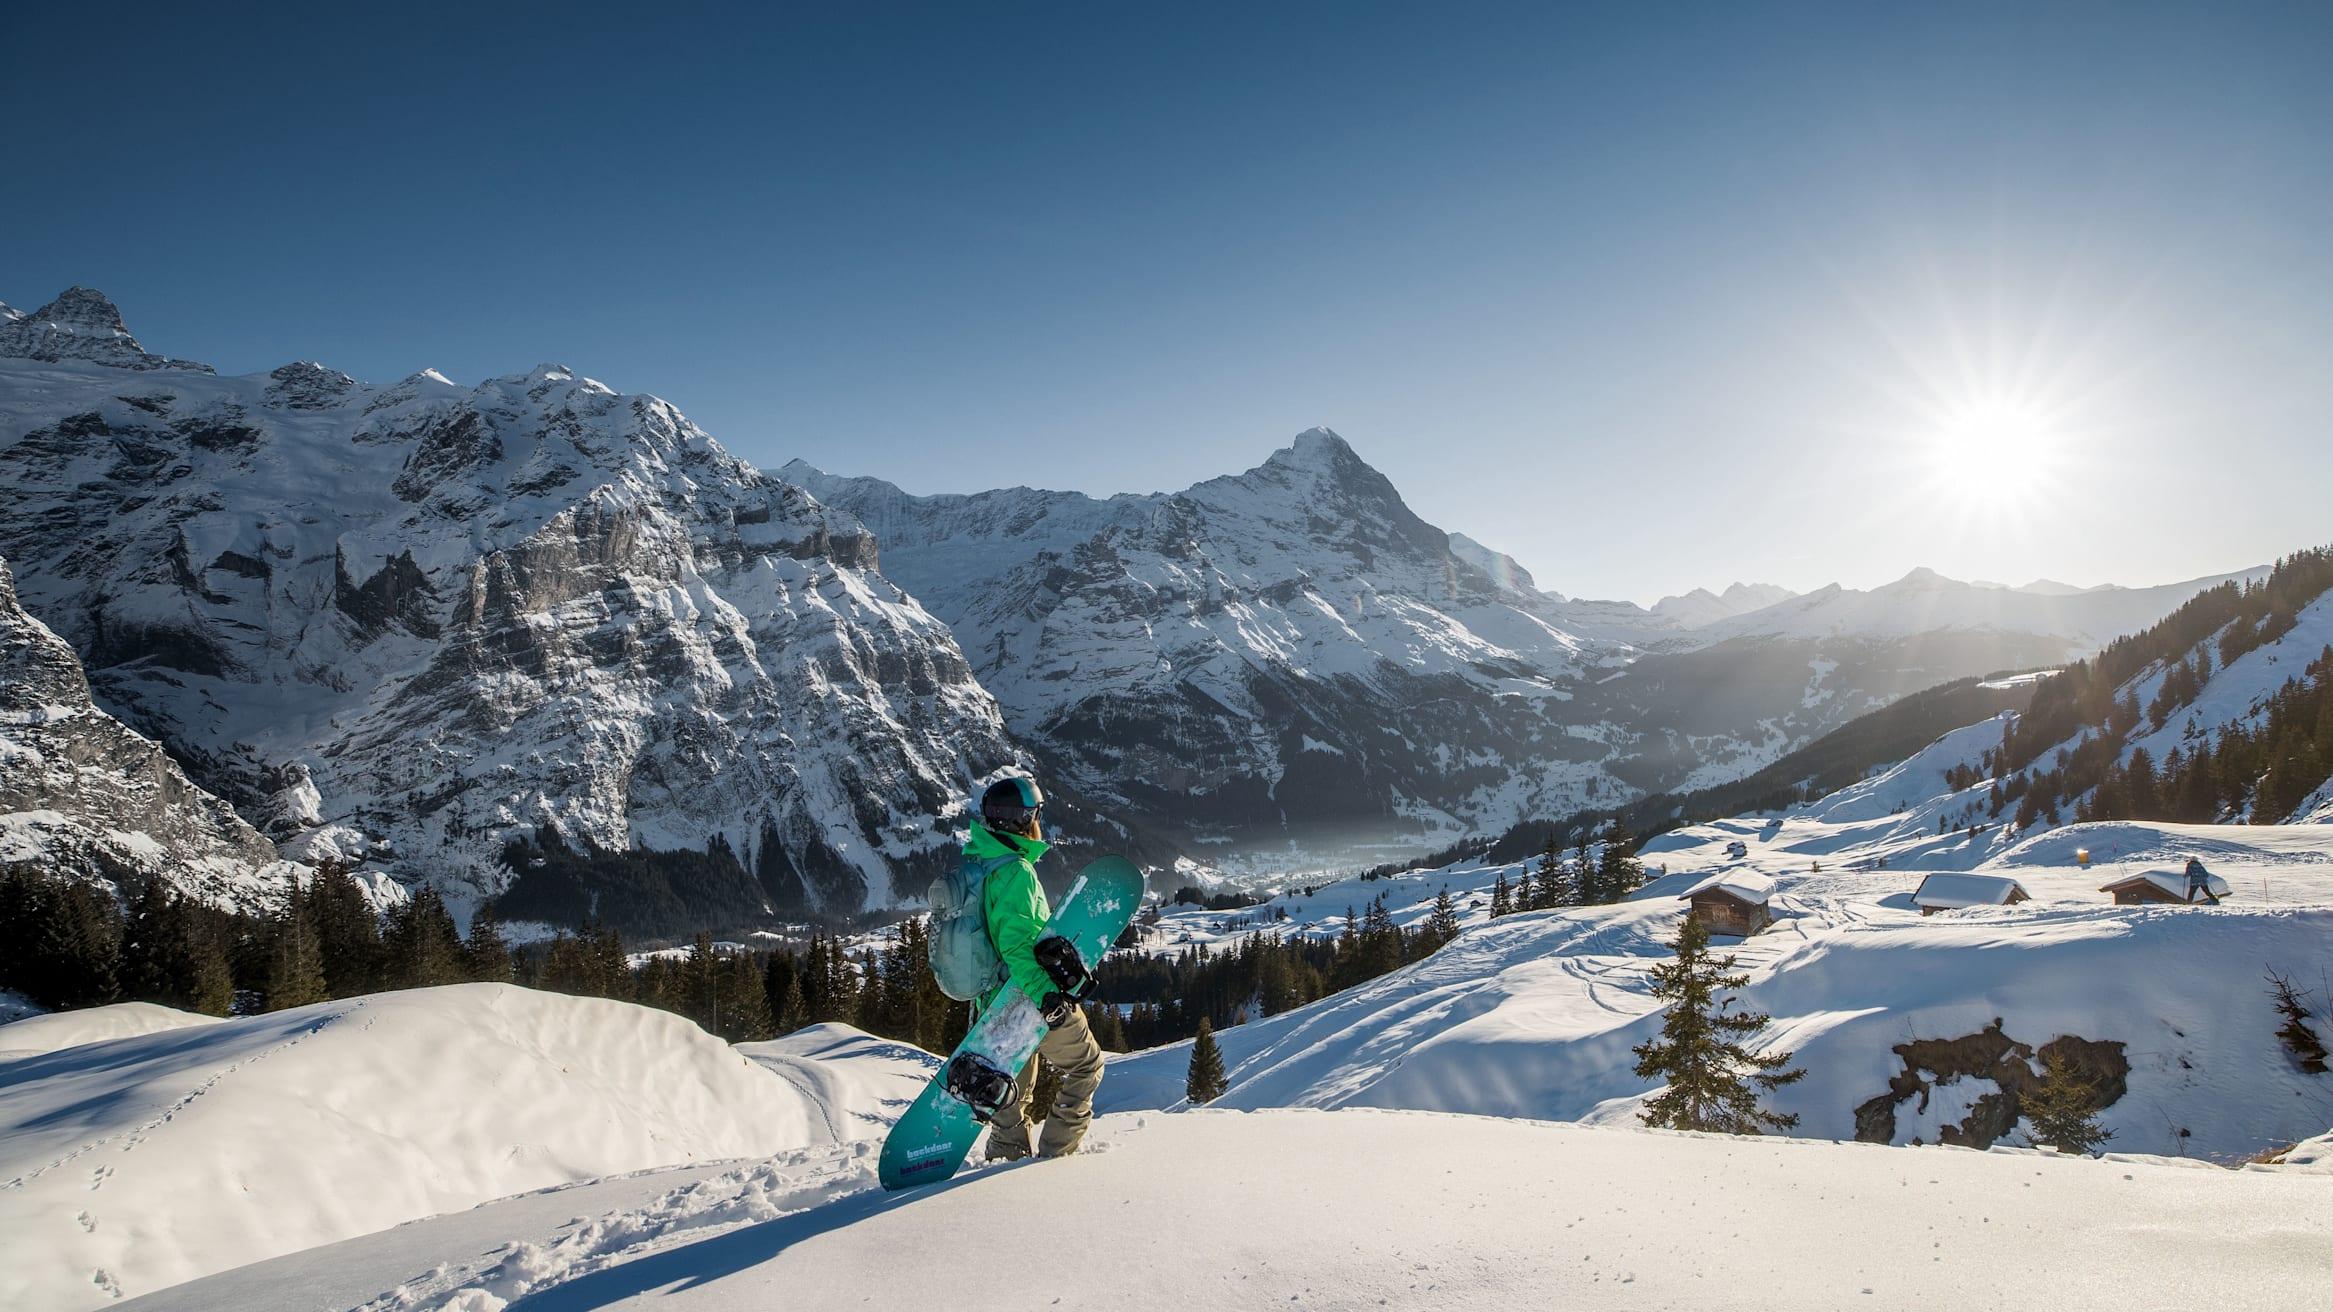 Jungfrau ski region Grindelwald Wengen snowboard Eiger